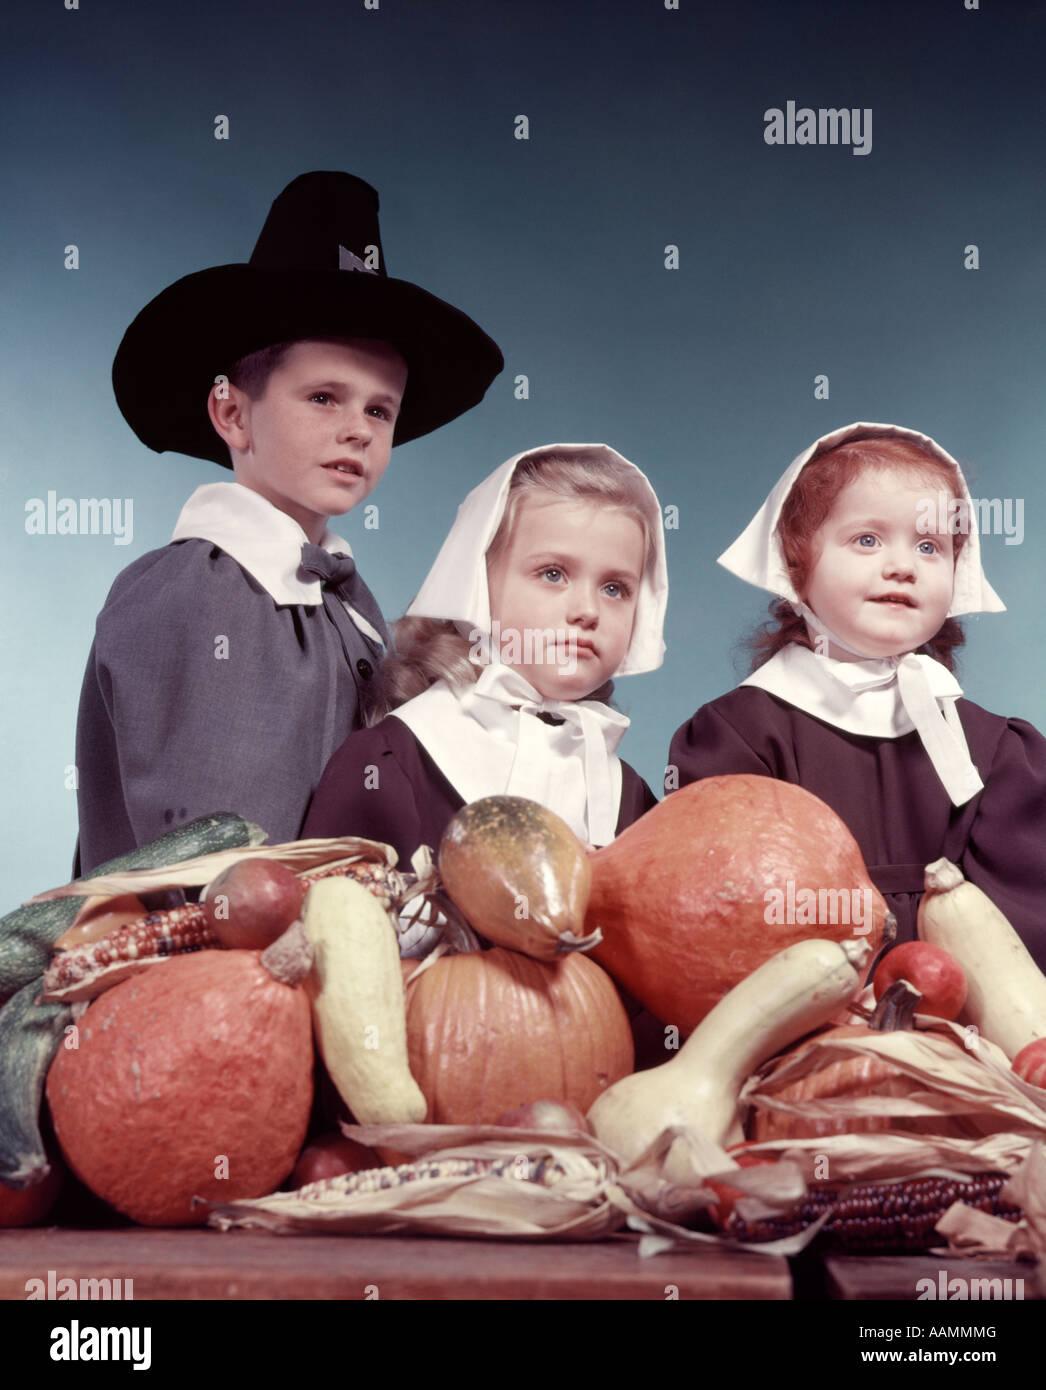 pilgrim single girls Single parenting adoption relationships pilgrim names girl: latin: verity: girl: latin: virtue: girl: latin: wisdom: girl: english.